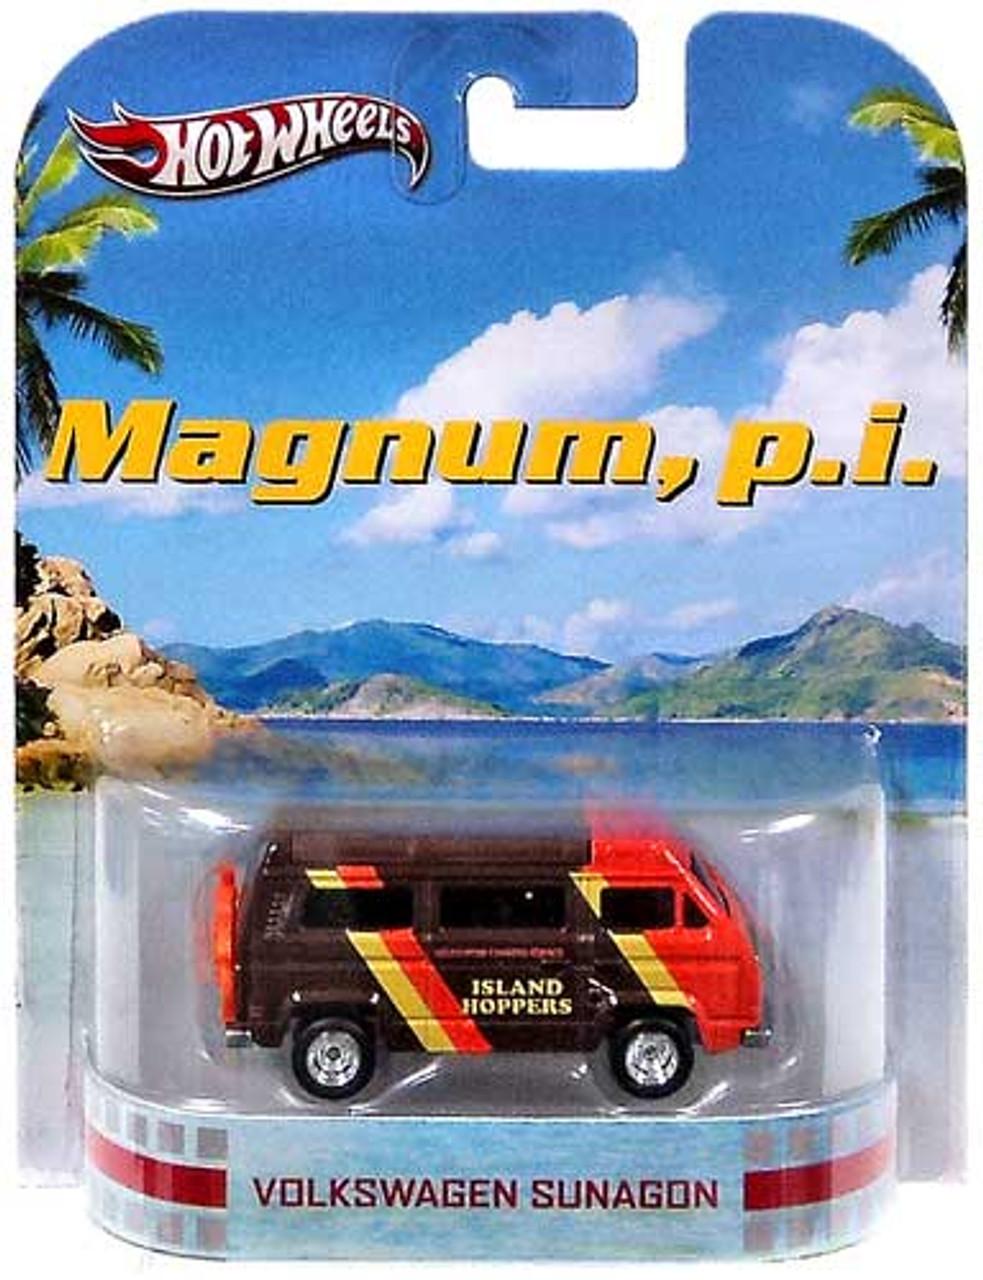 Magnum, P.I. Hot Wheels Retro Volkswagen Sunagon Diecast Vehicle